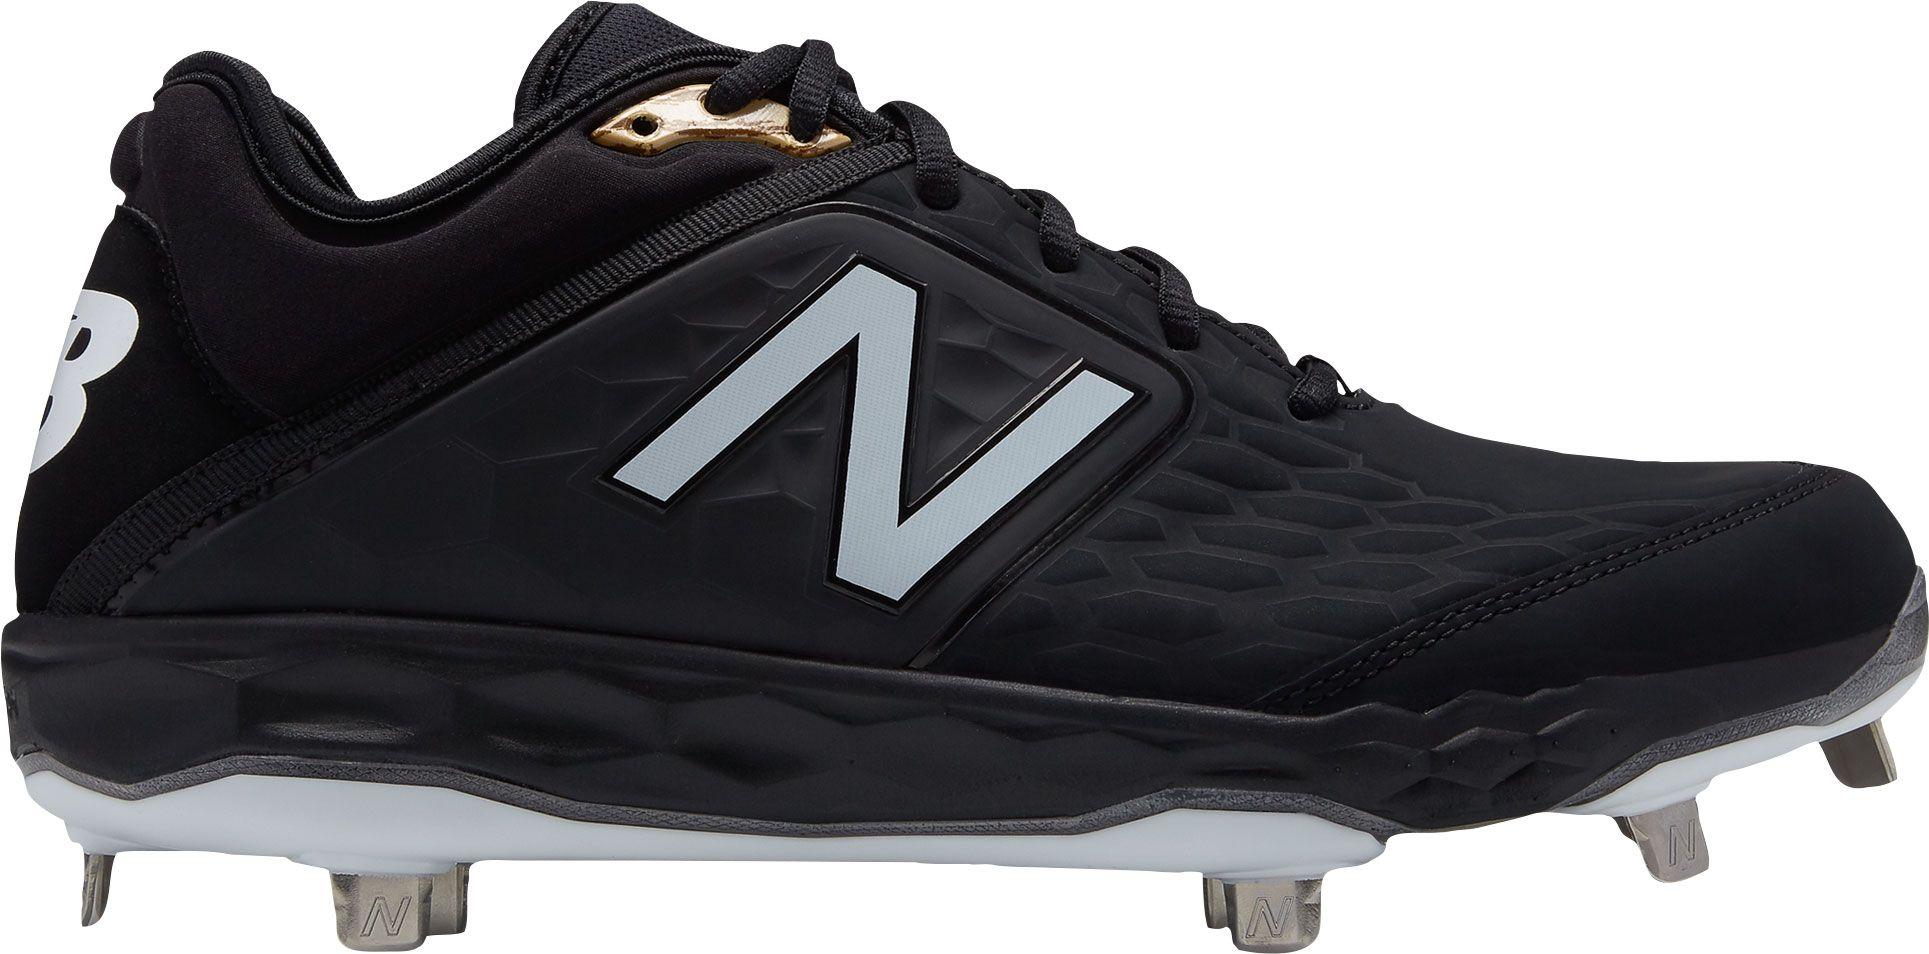 new balance black cleats